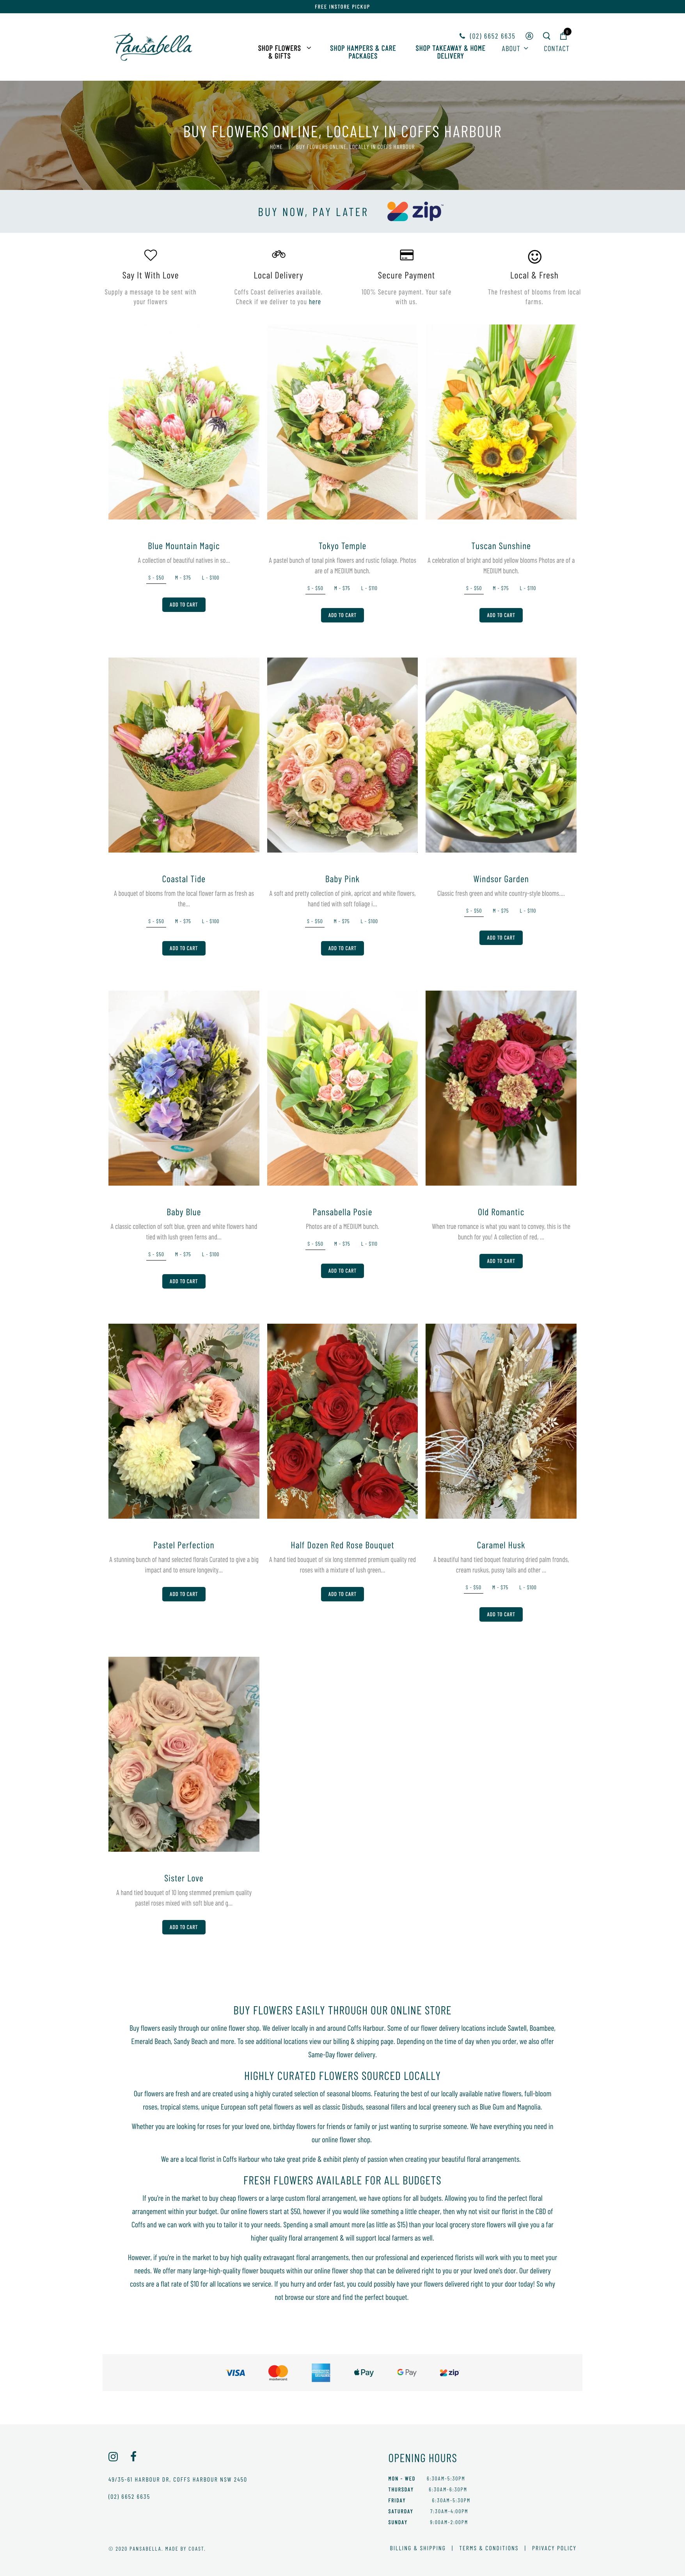 Website Design & Development for Pansabella Providores